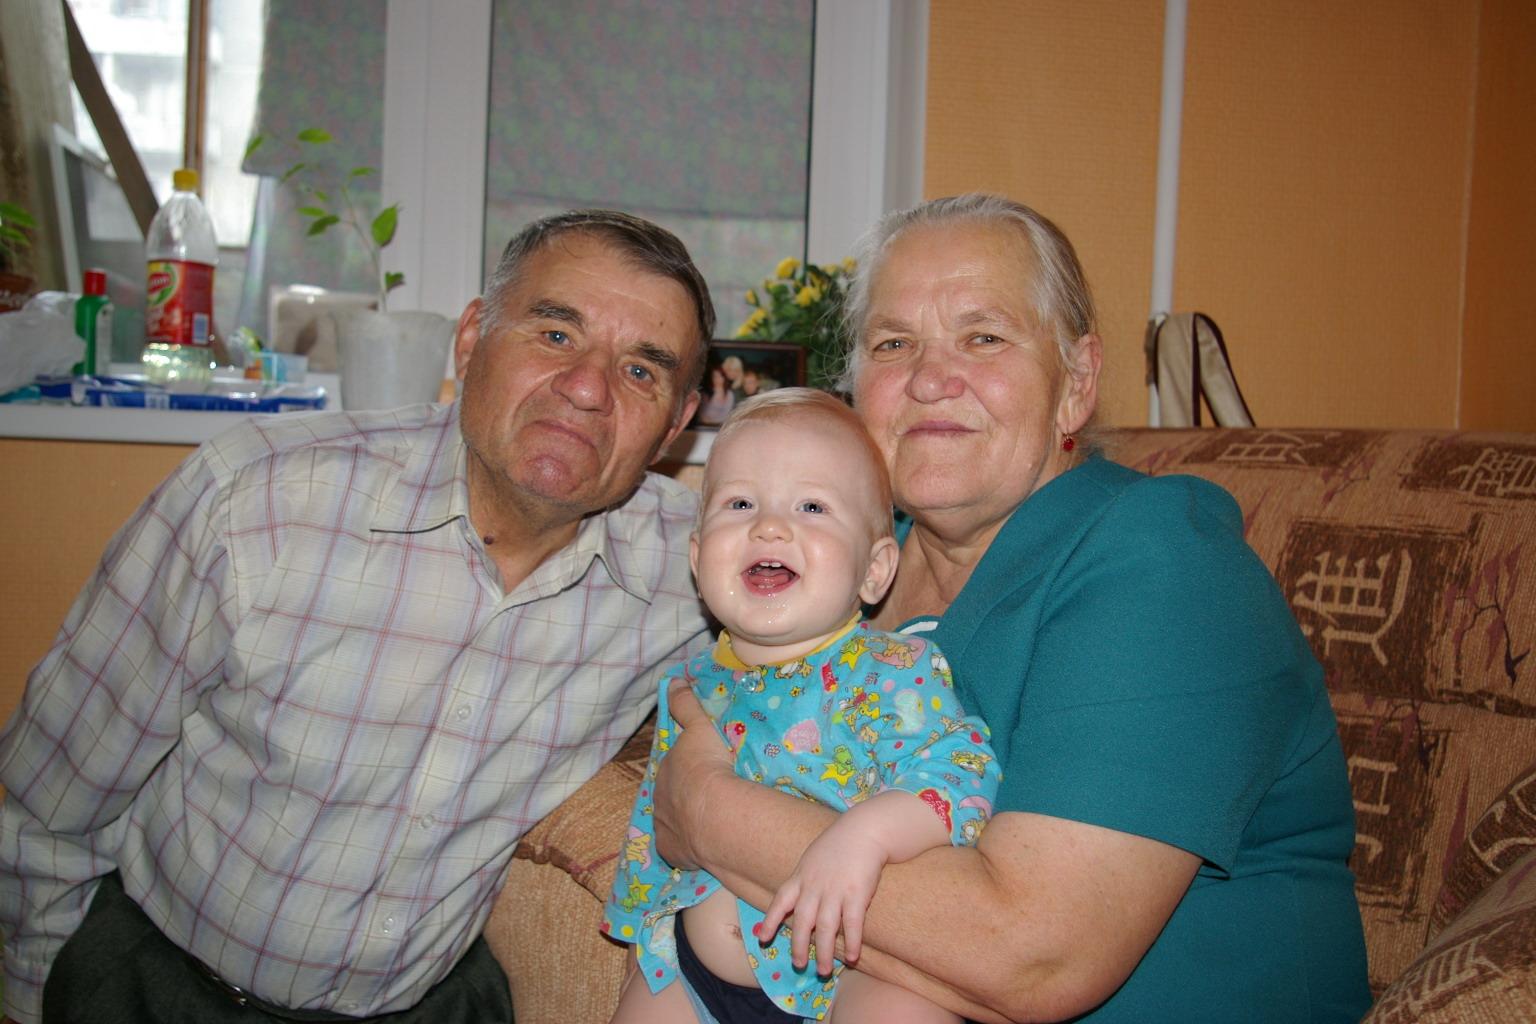 С прабабушкой и прадедушкой.. Стар и мал